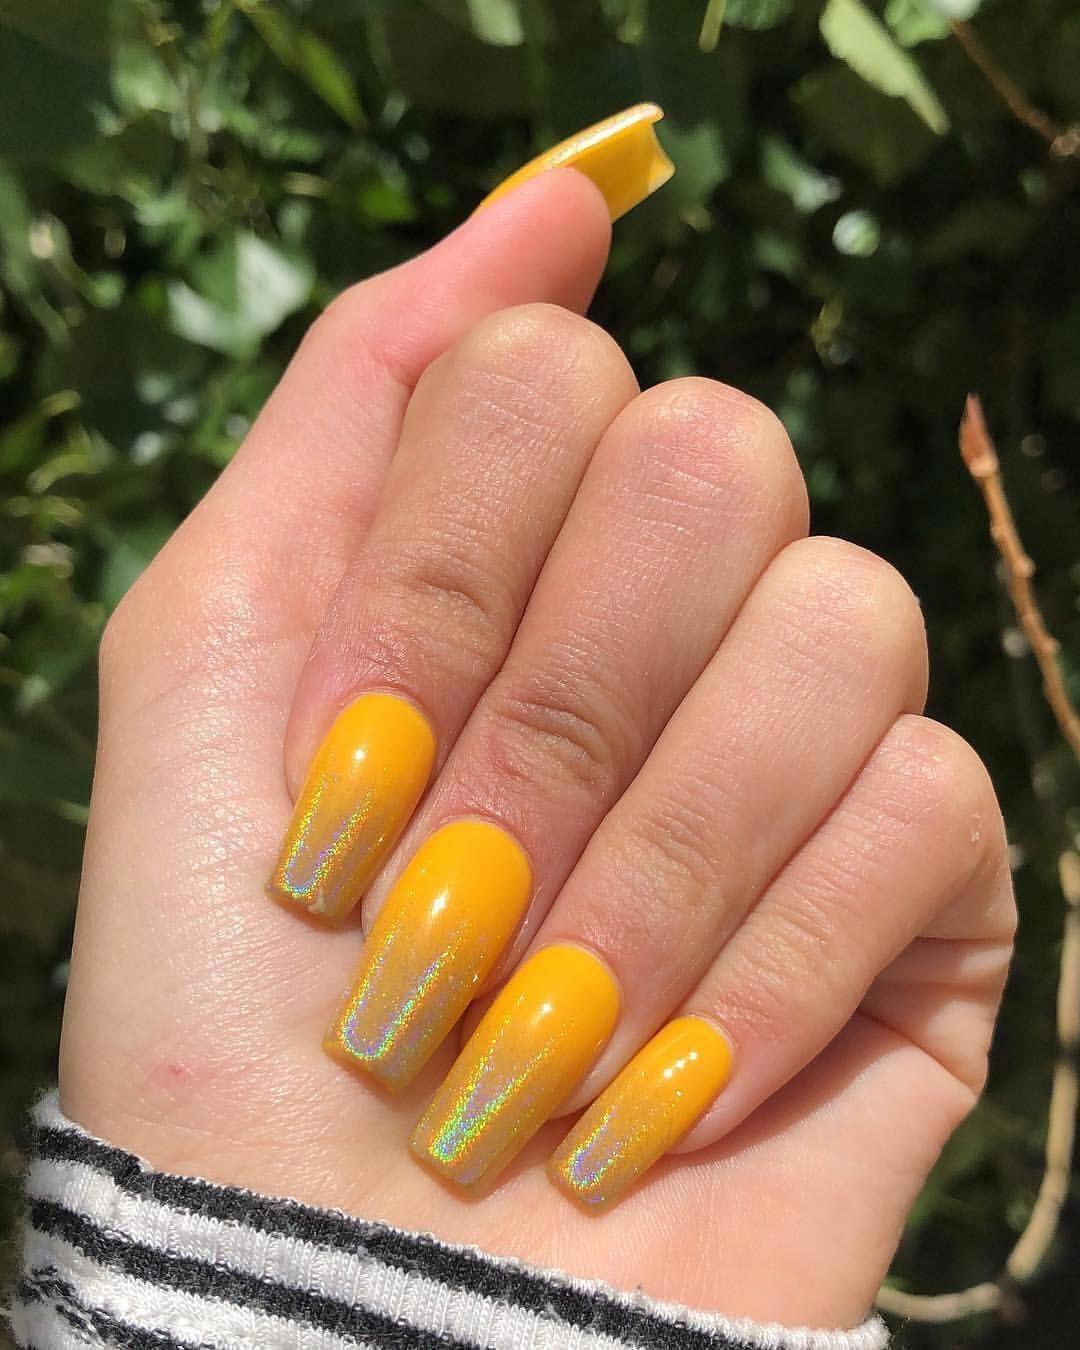 "Model Malay on Instagram: ""Finally got my hands on @apresnailofficial ������������������ ▪️ ������: @darleennee_nails #yellow #yellownails #holographic #holographicnails…"""